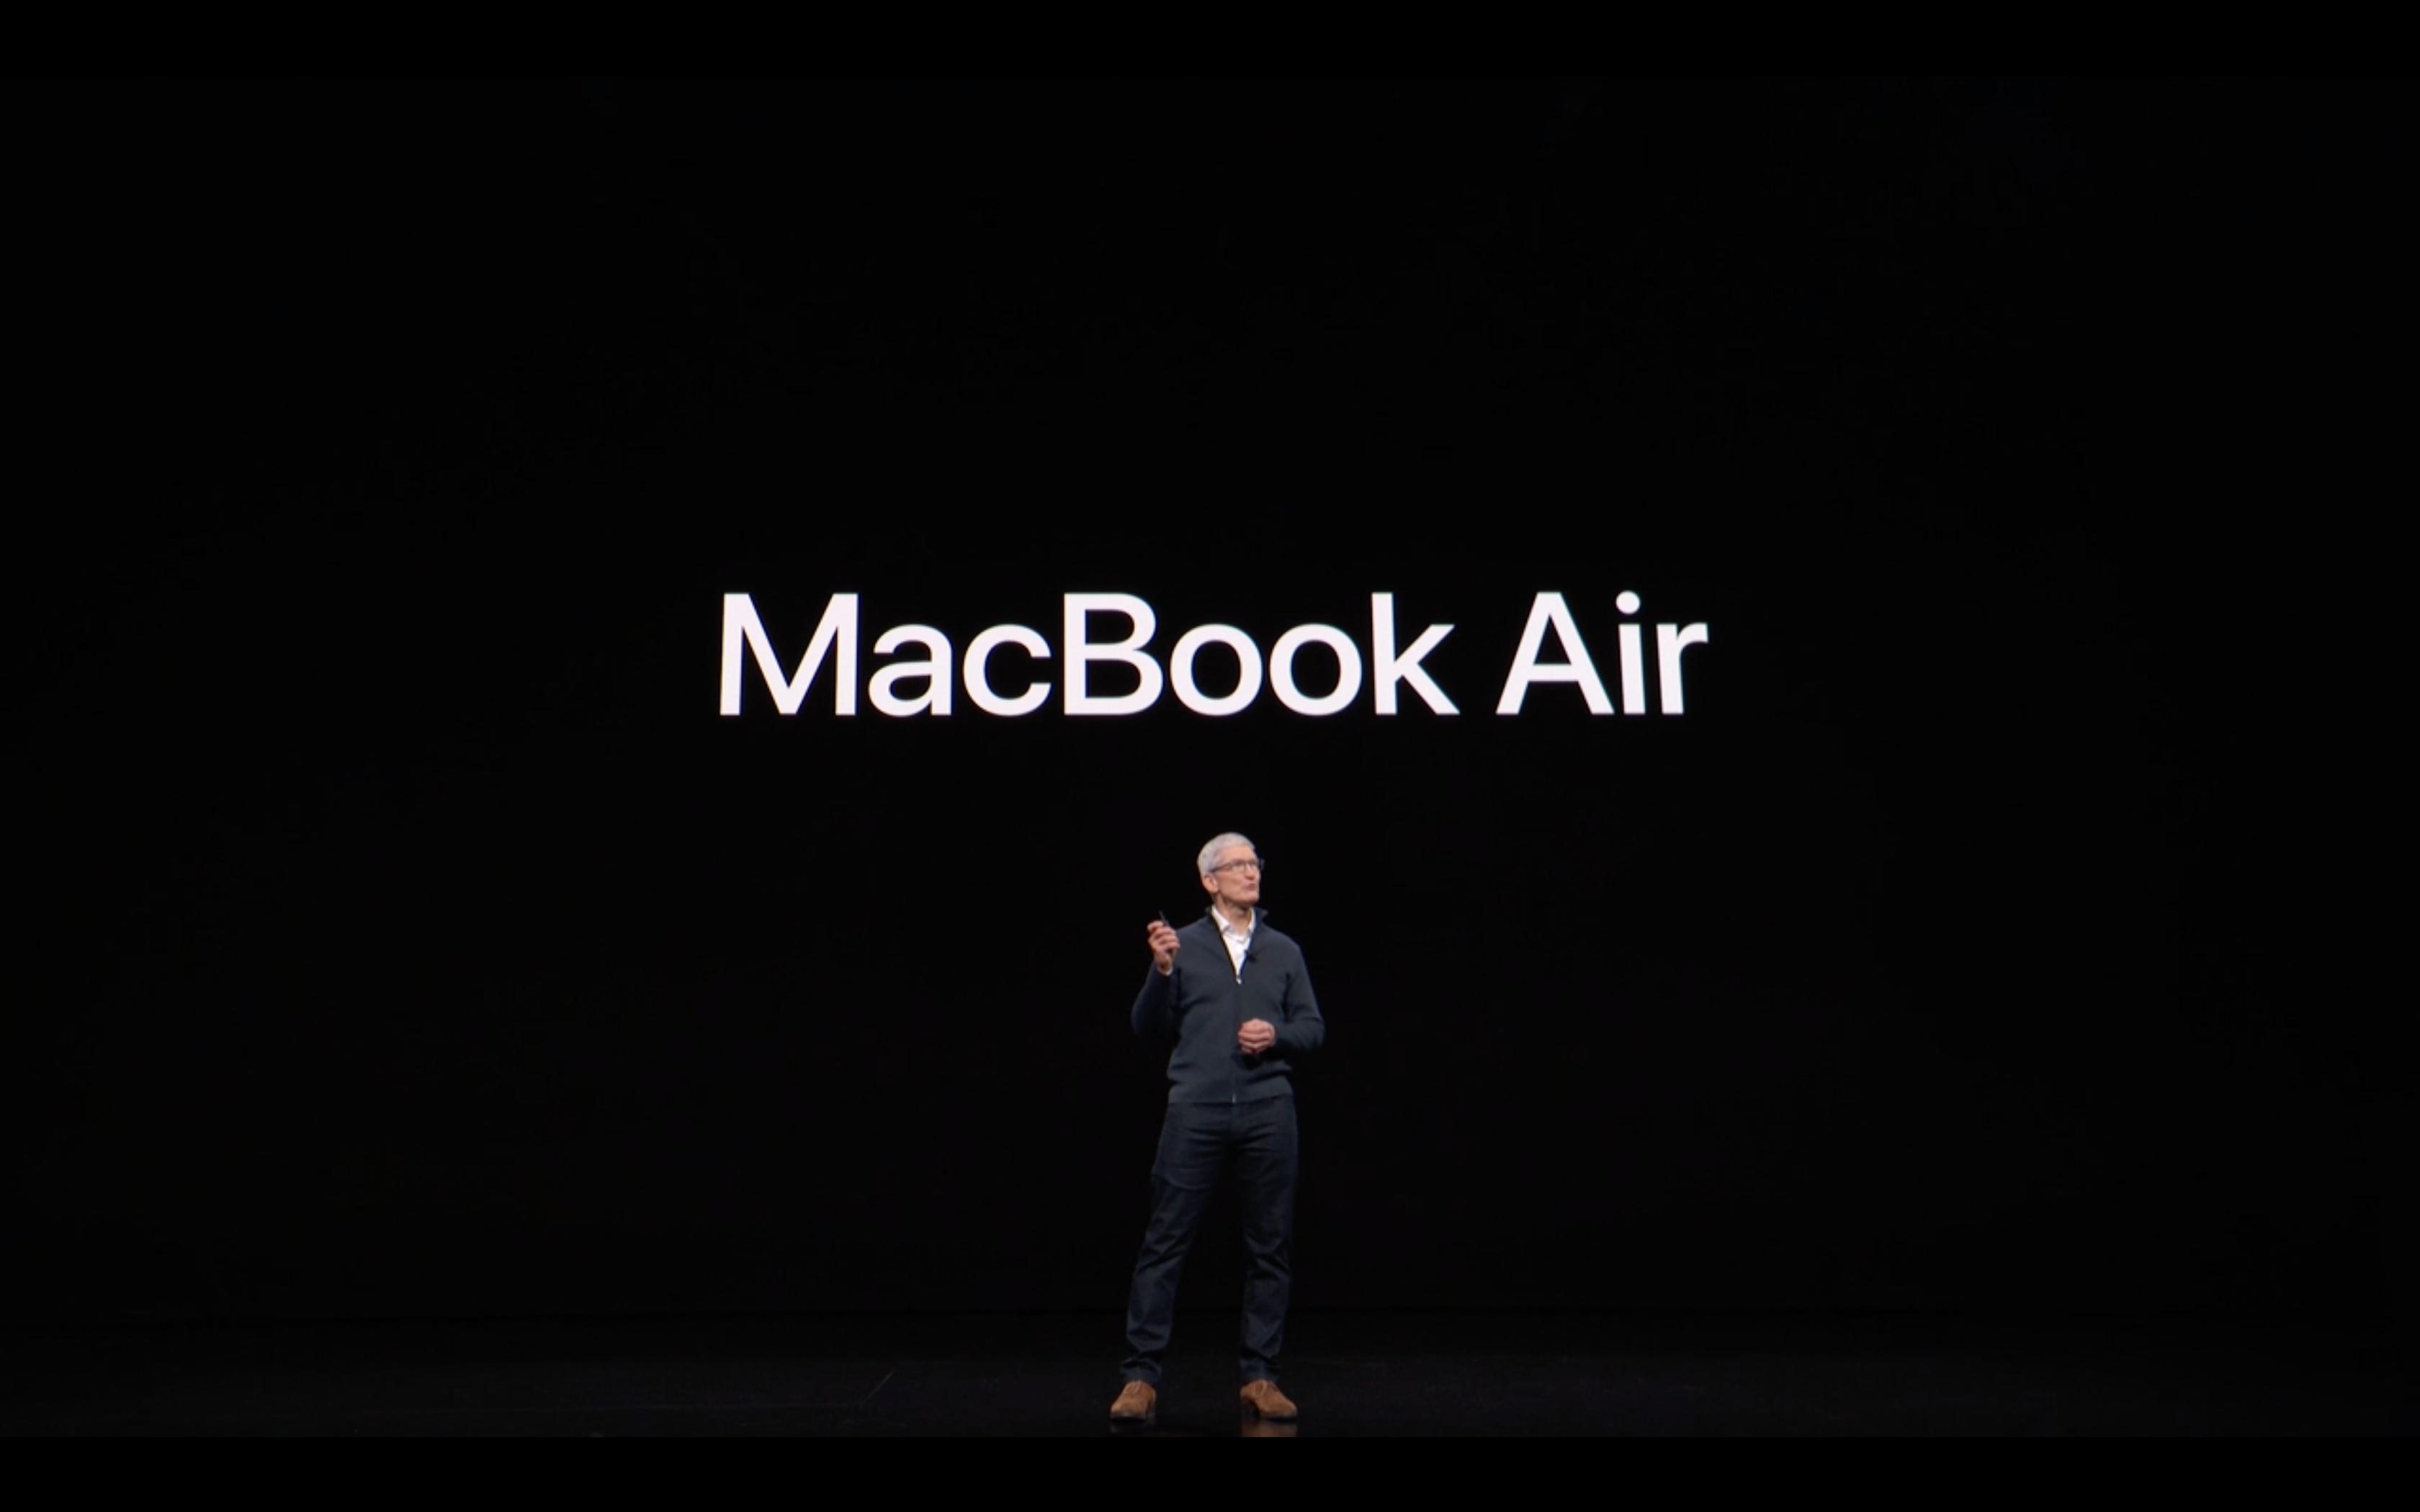 Apple Special Event - MacBook Air